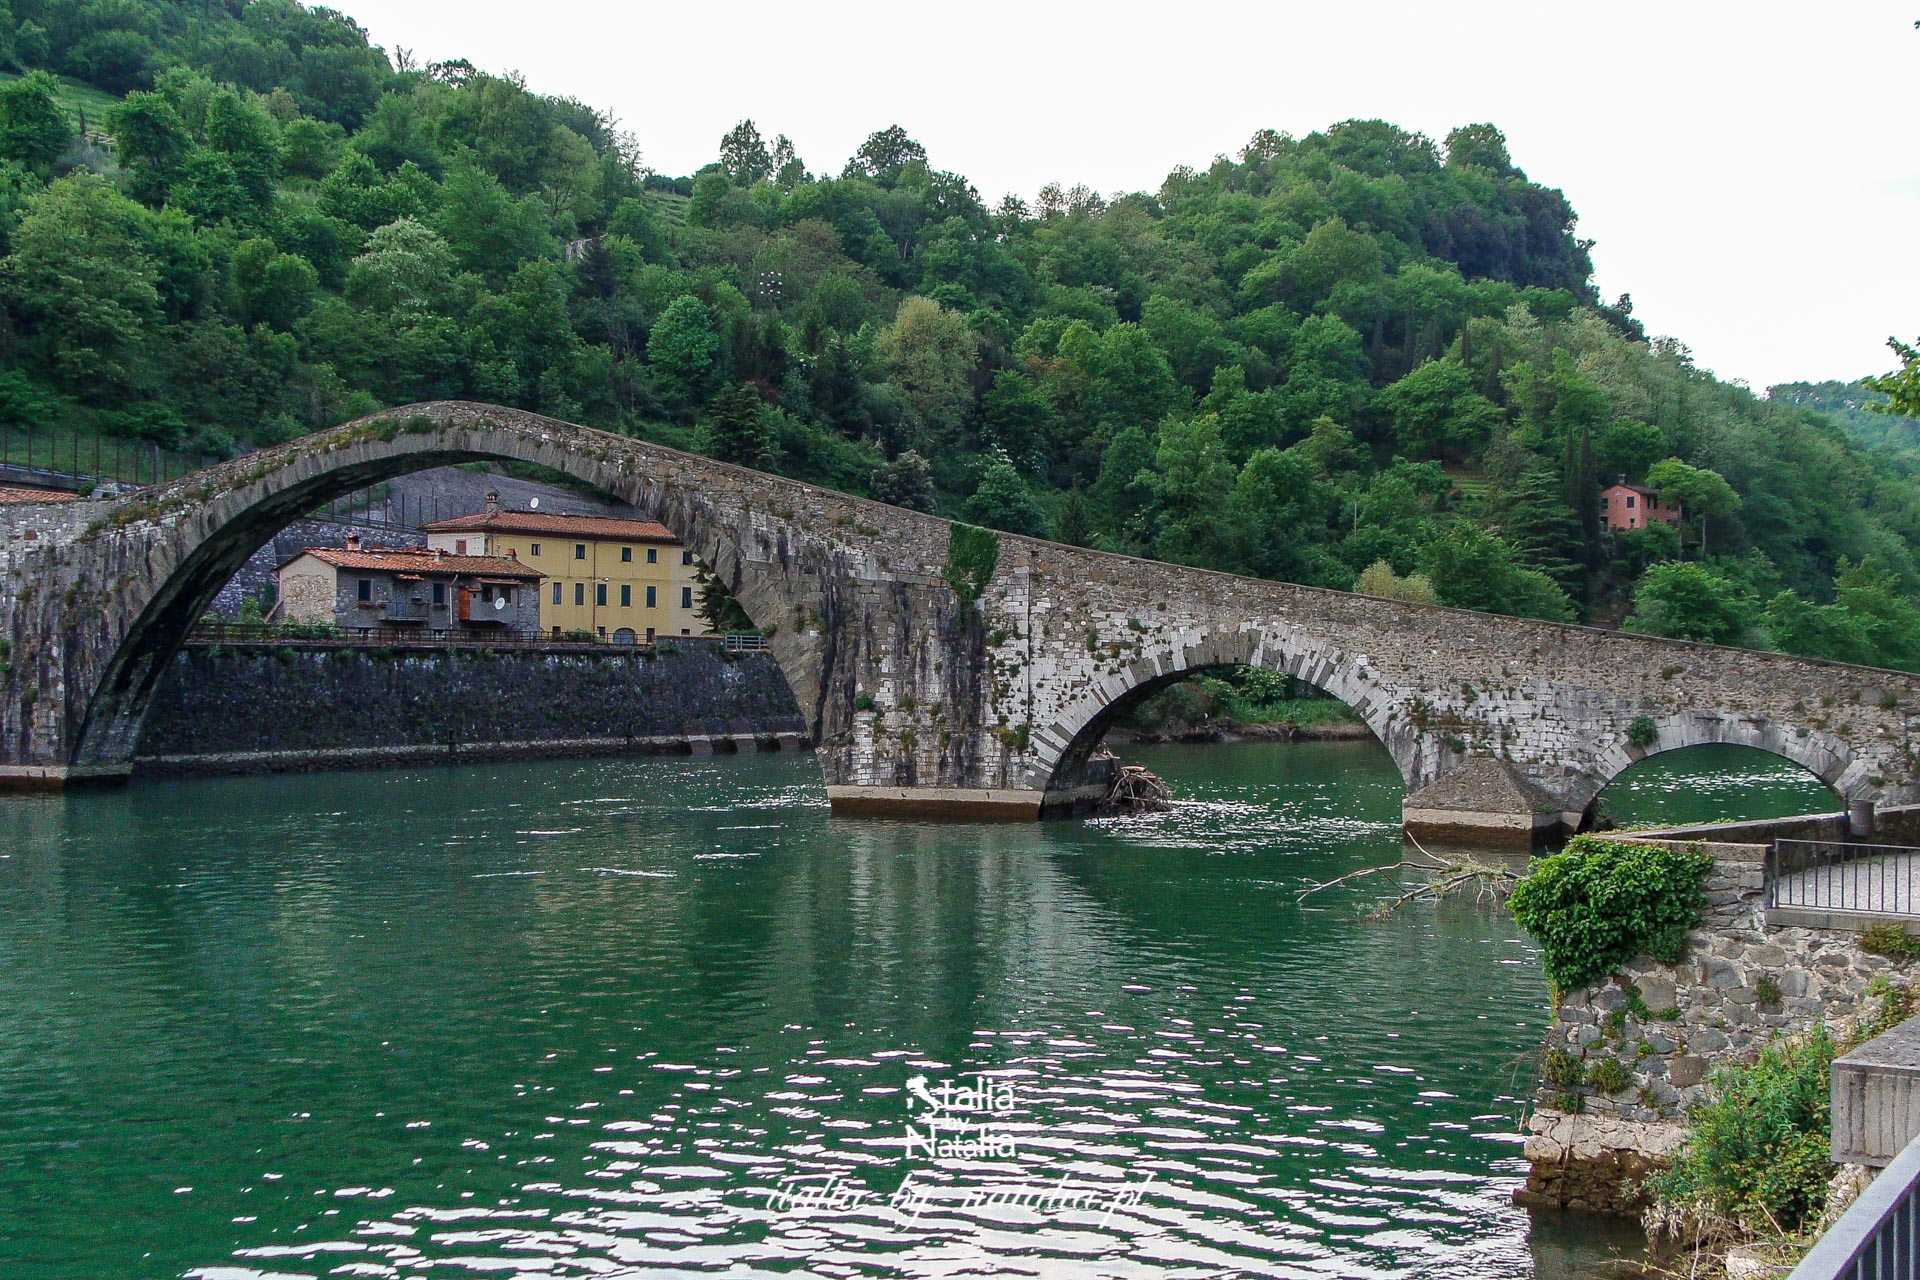 Ponte della Maddalena (Ponte del Diavolo) w Borgo a Mozzano, prowincja Lukka. Diabelski most w Toskanii